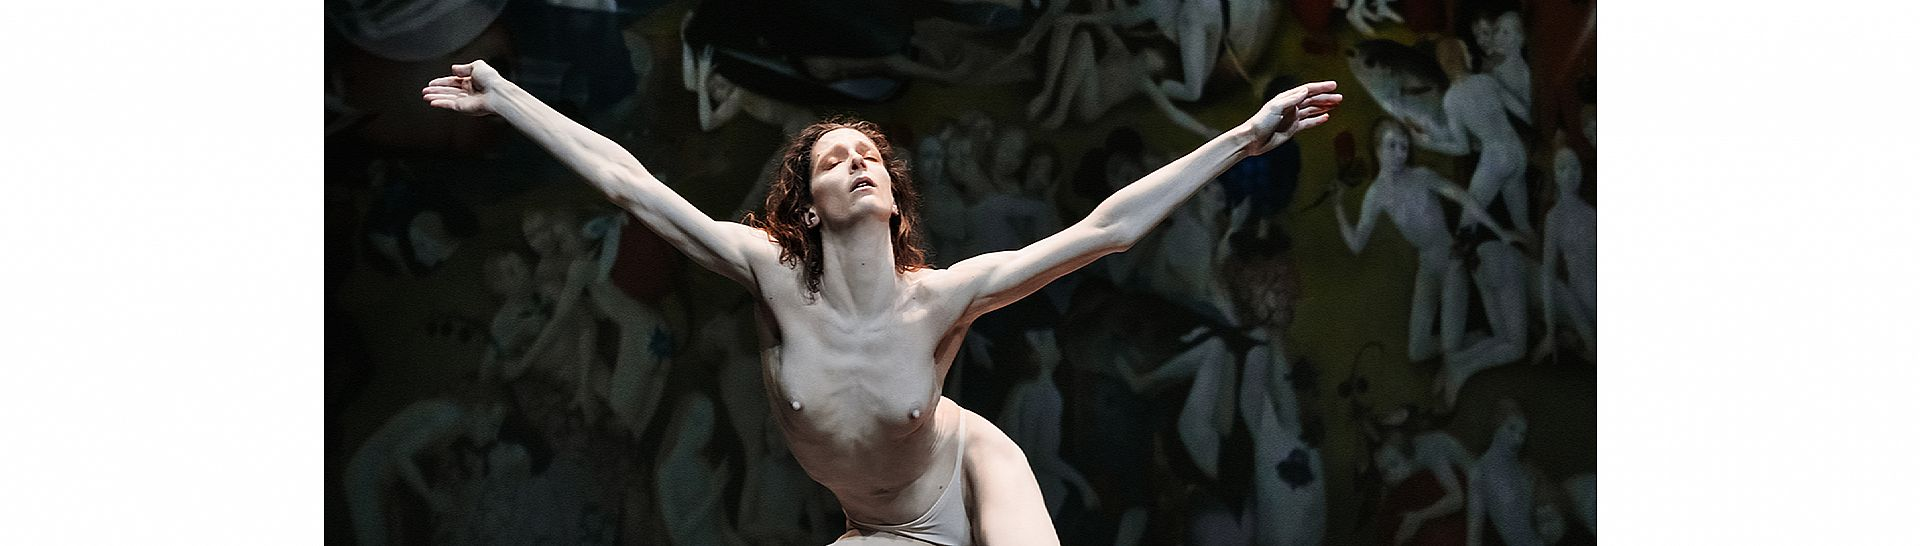 Marie Chouinard Dance Company05